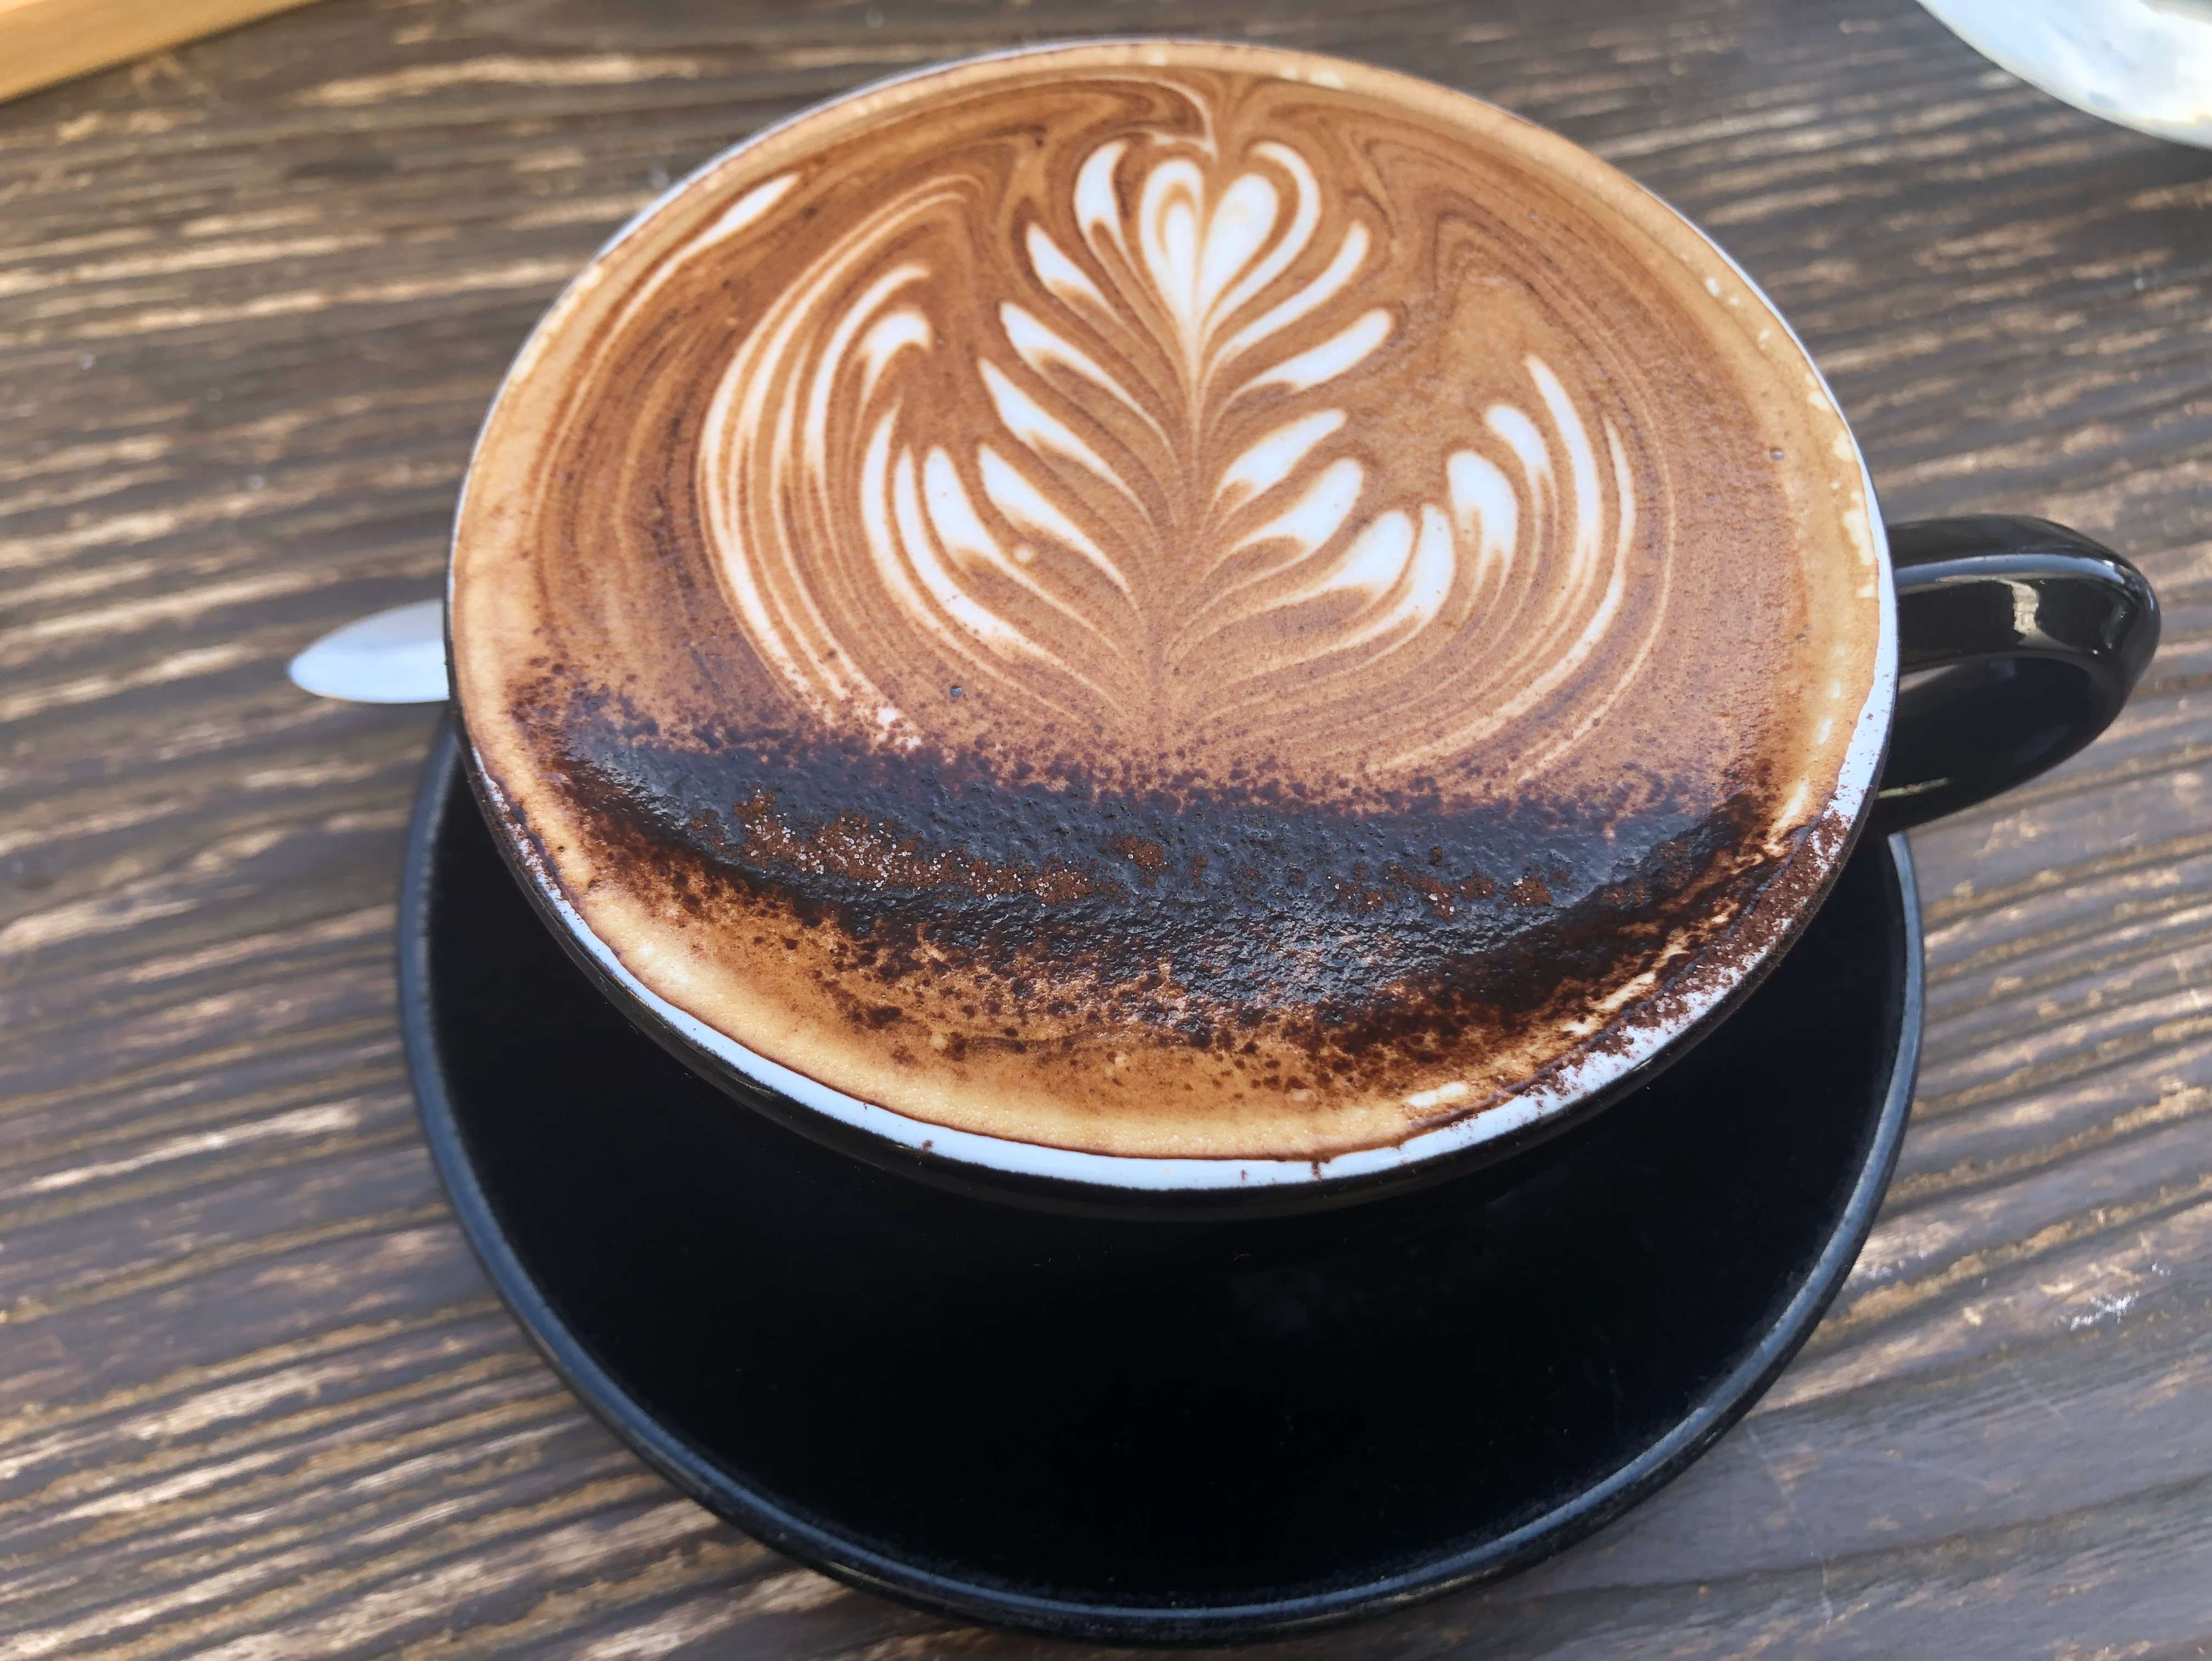 Blk Mlk Specialty Coffee